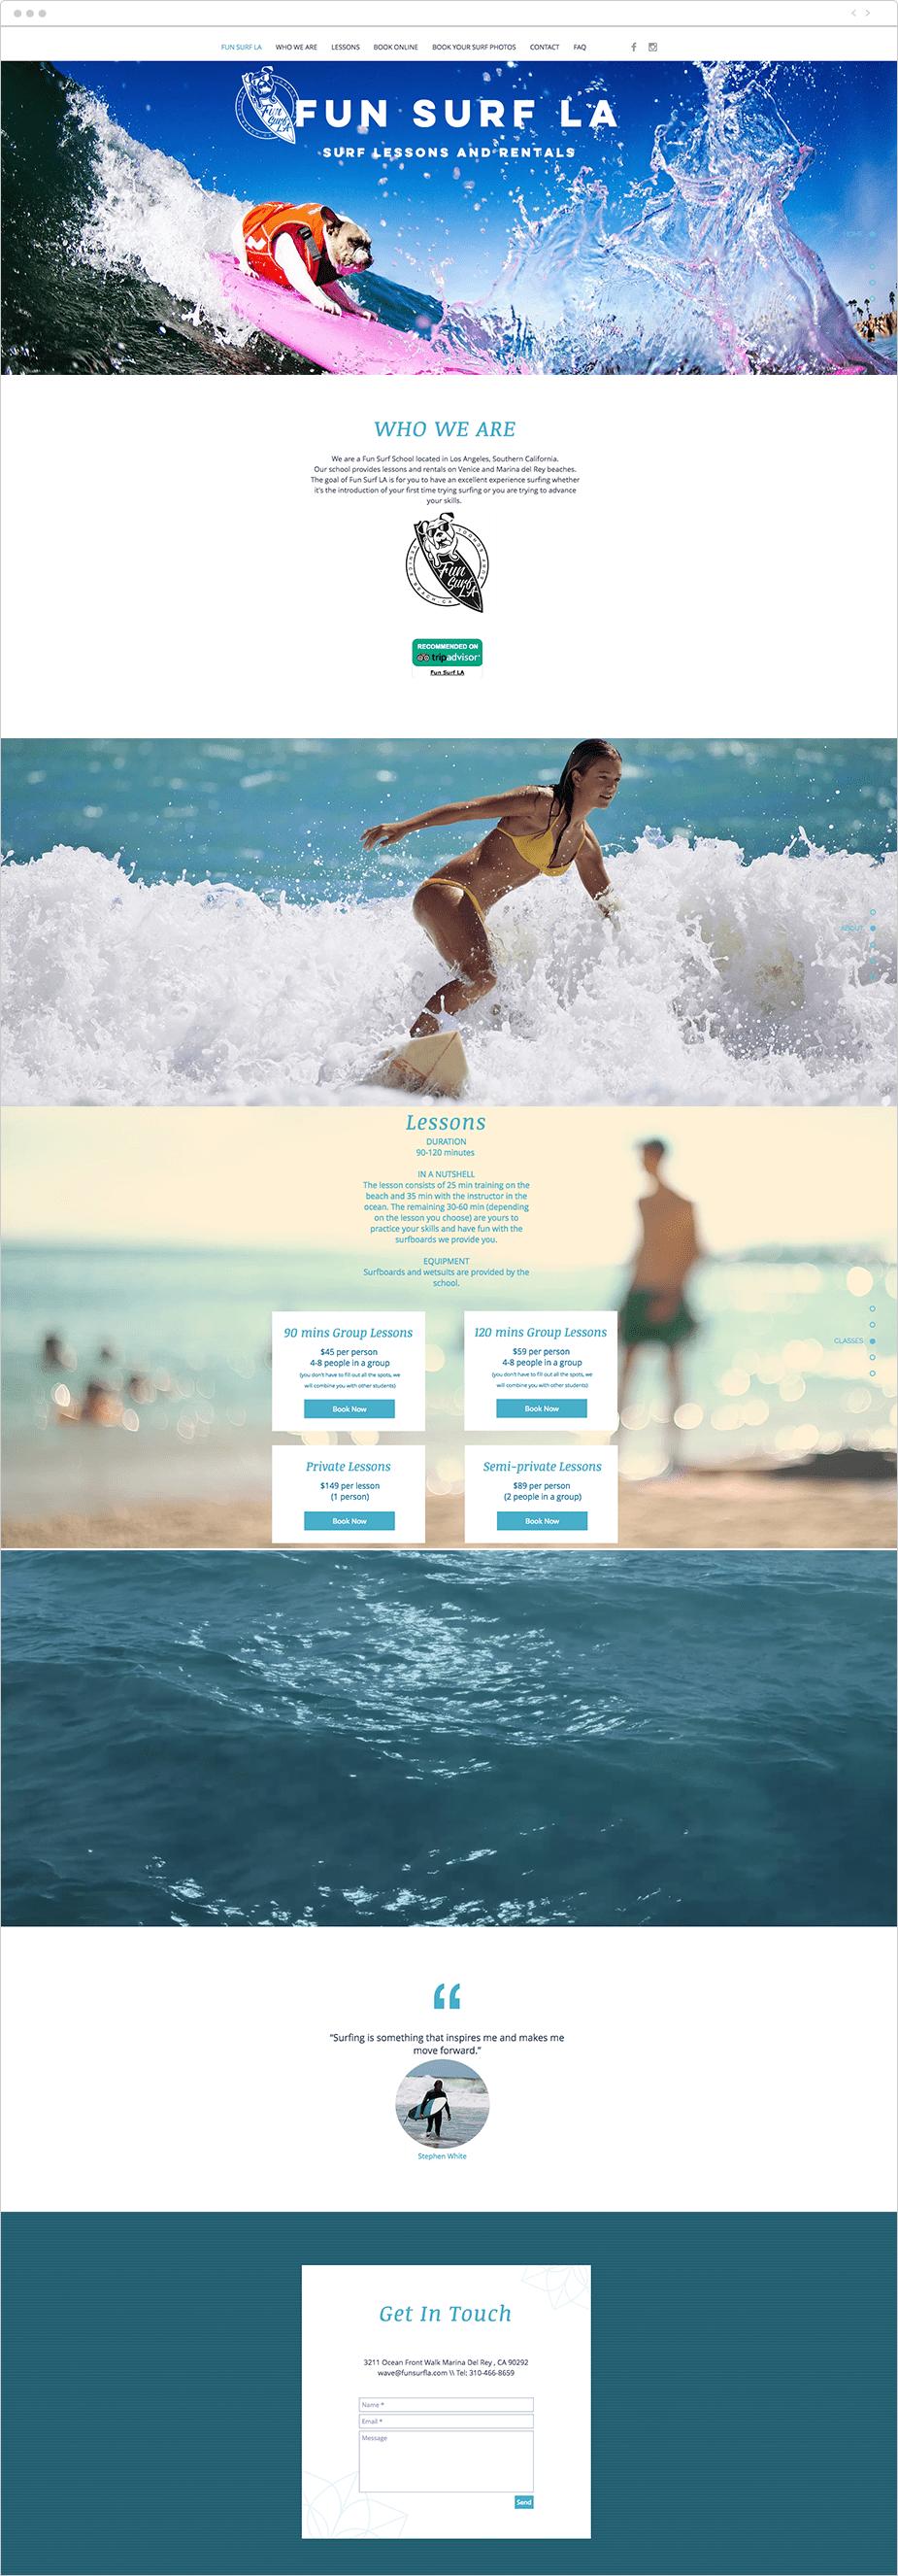 Wix Bookings website: Fun Surf LA